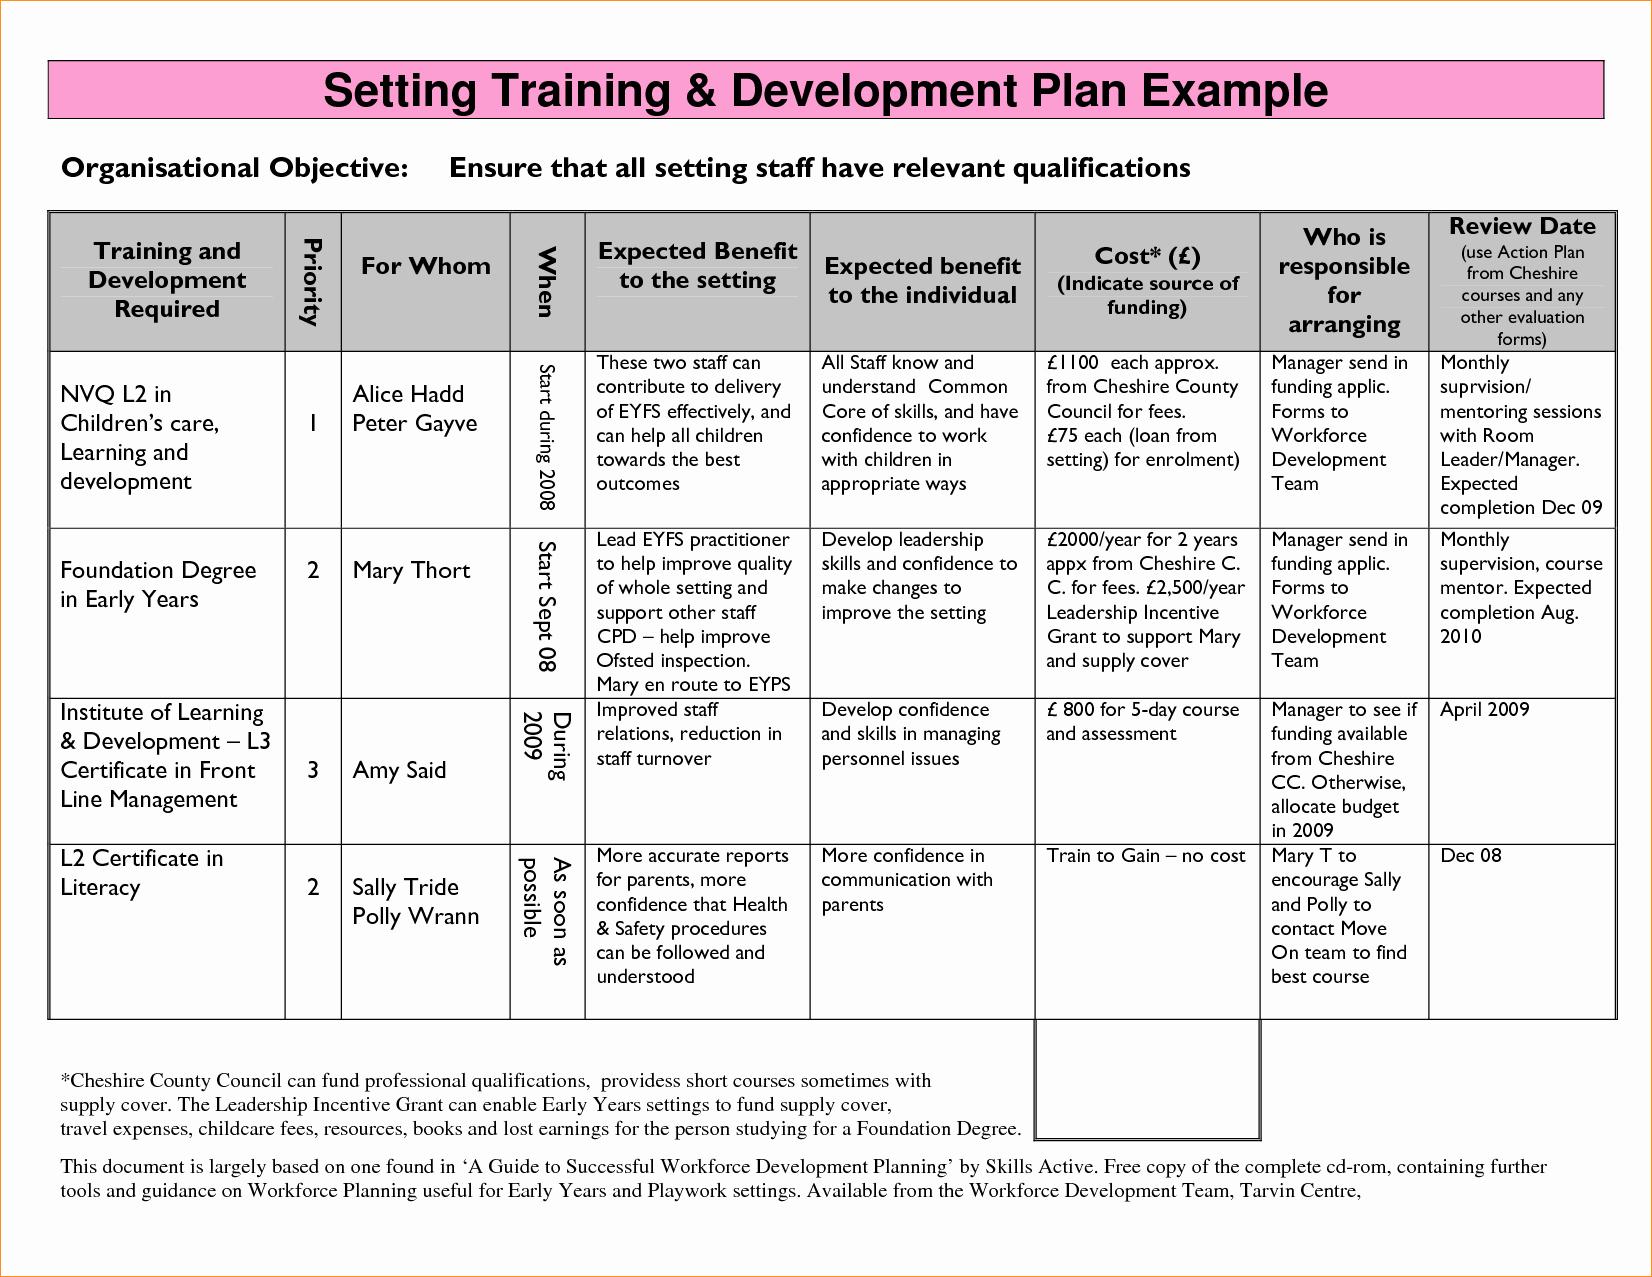 Business Development Plan Example Lovely Business Development Plan Sample – Business form Templates